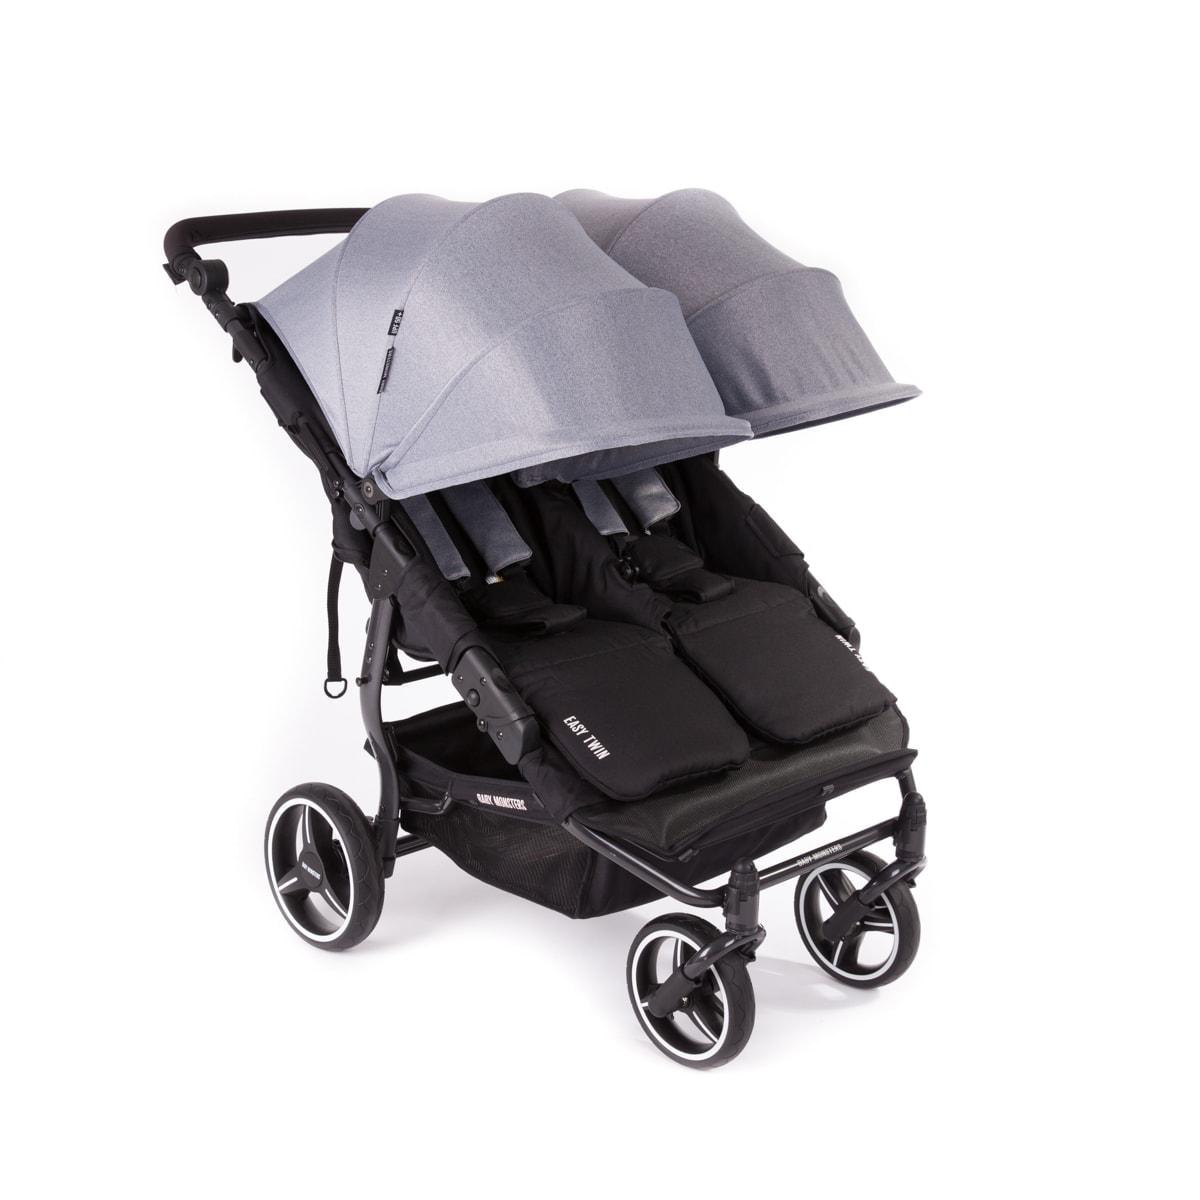 Capota gris carro gemelar easy twin 3.0s